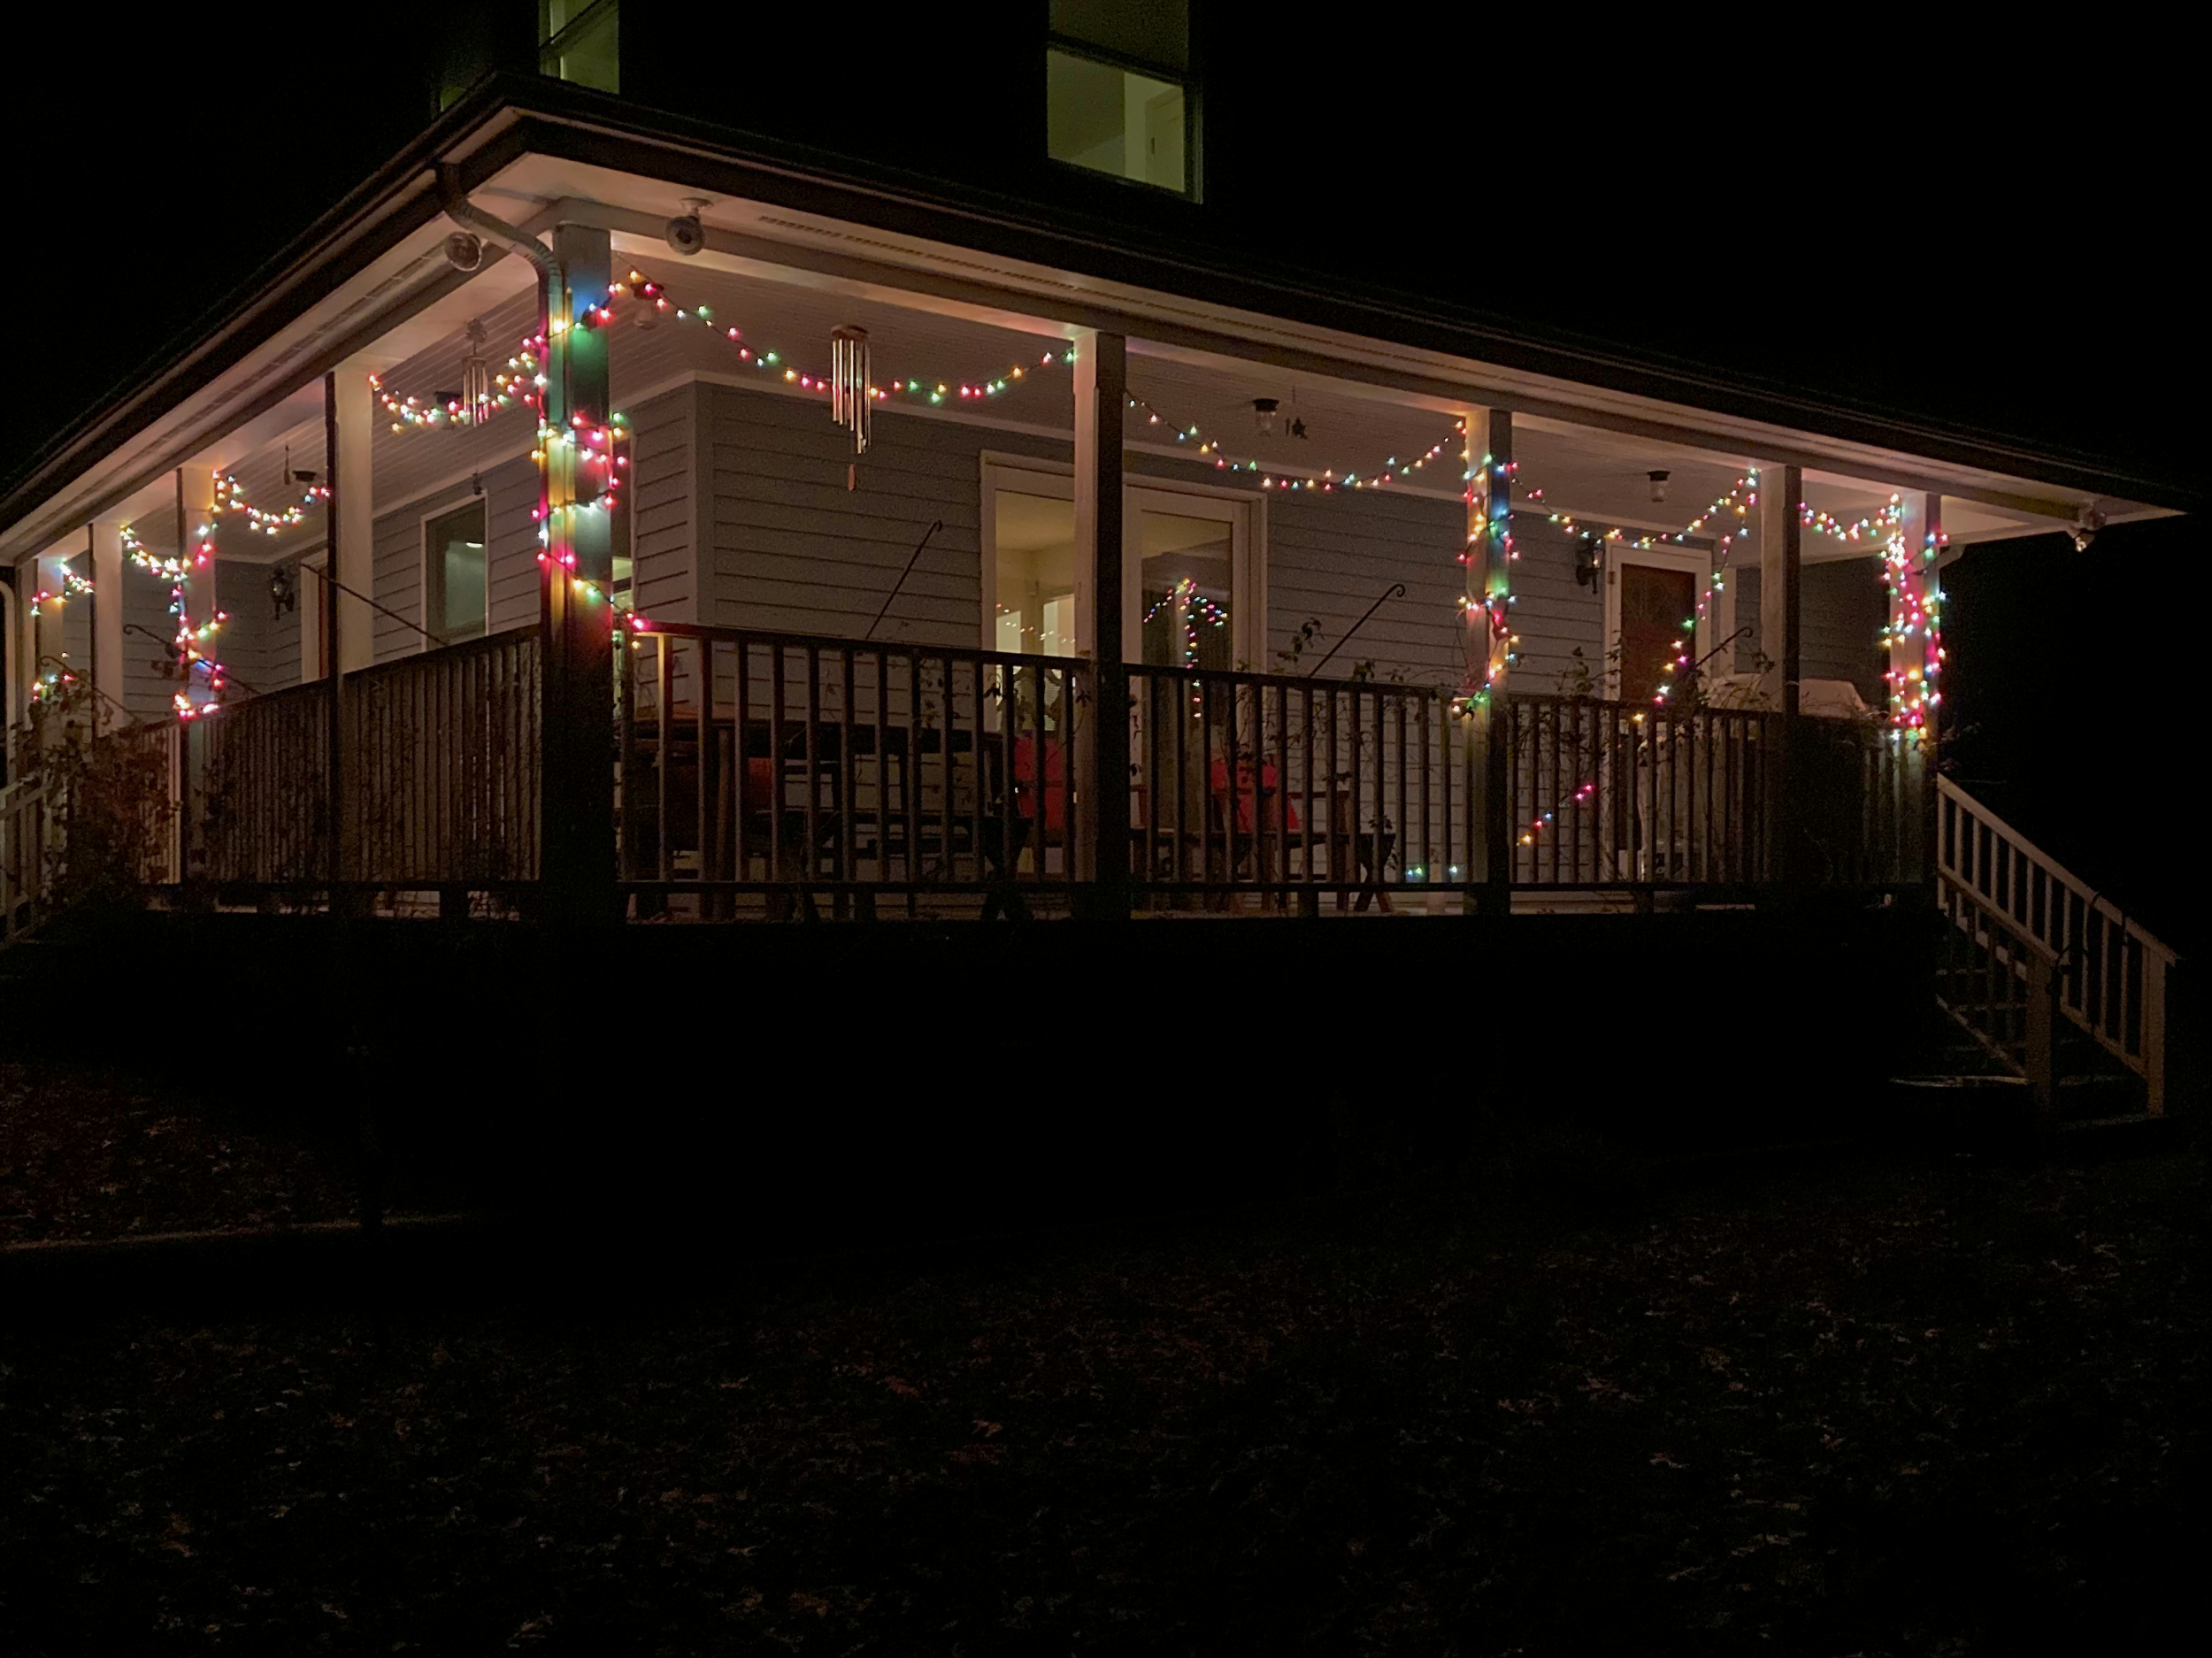 Christmas Lights on the House, by David B. Coe